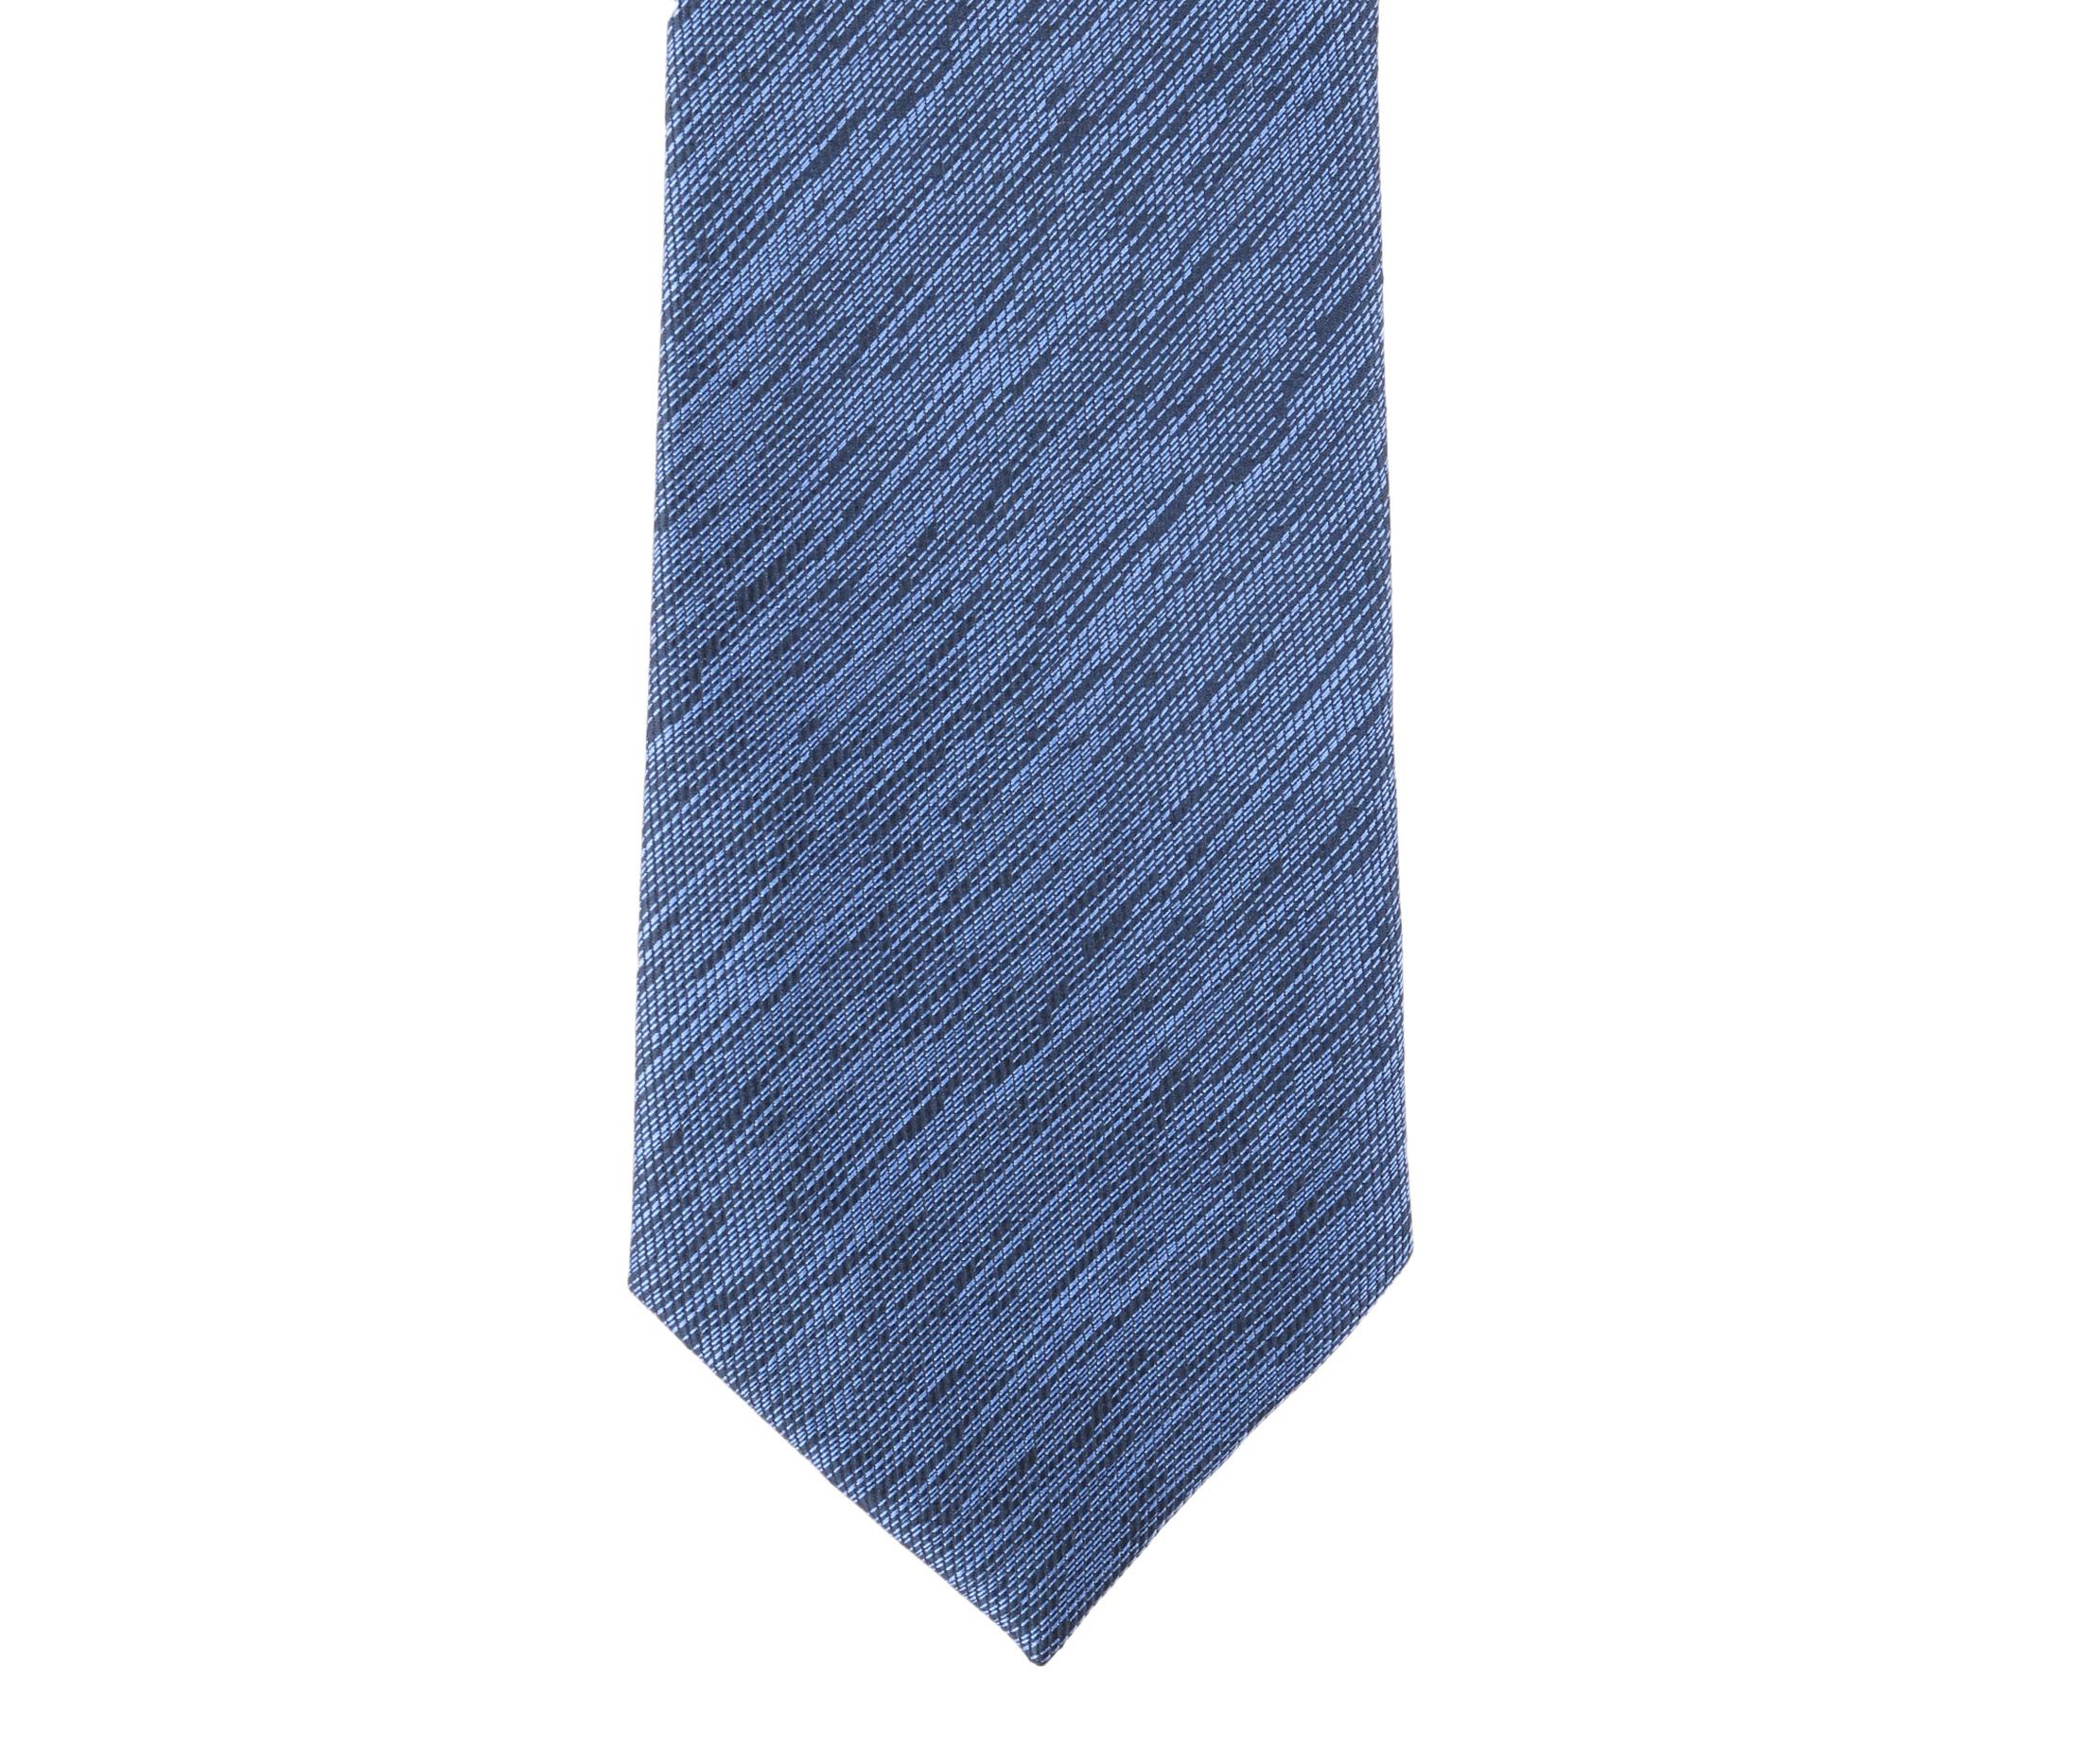 Krawatte Seide Blue 9-17 foto 1